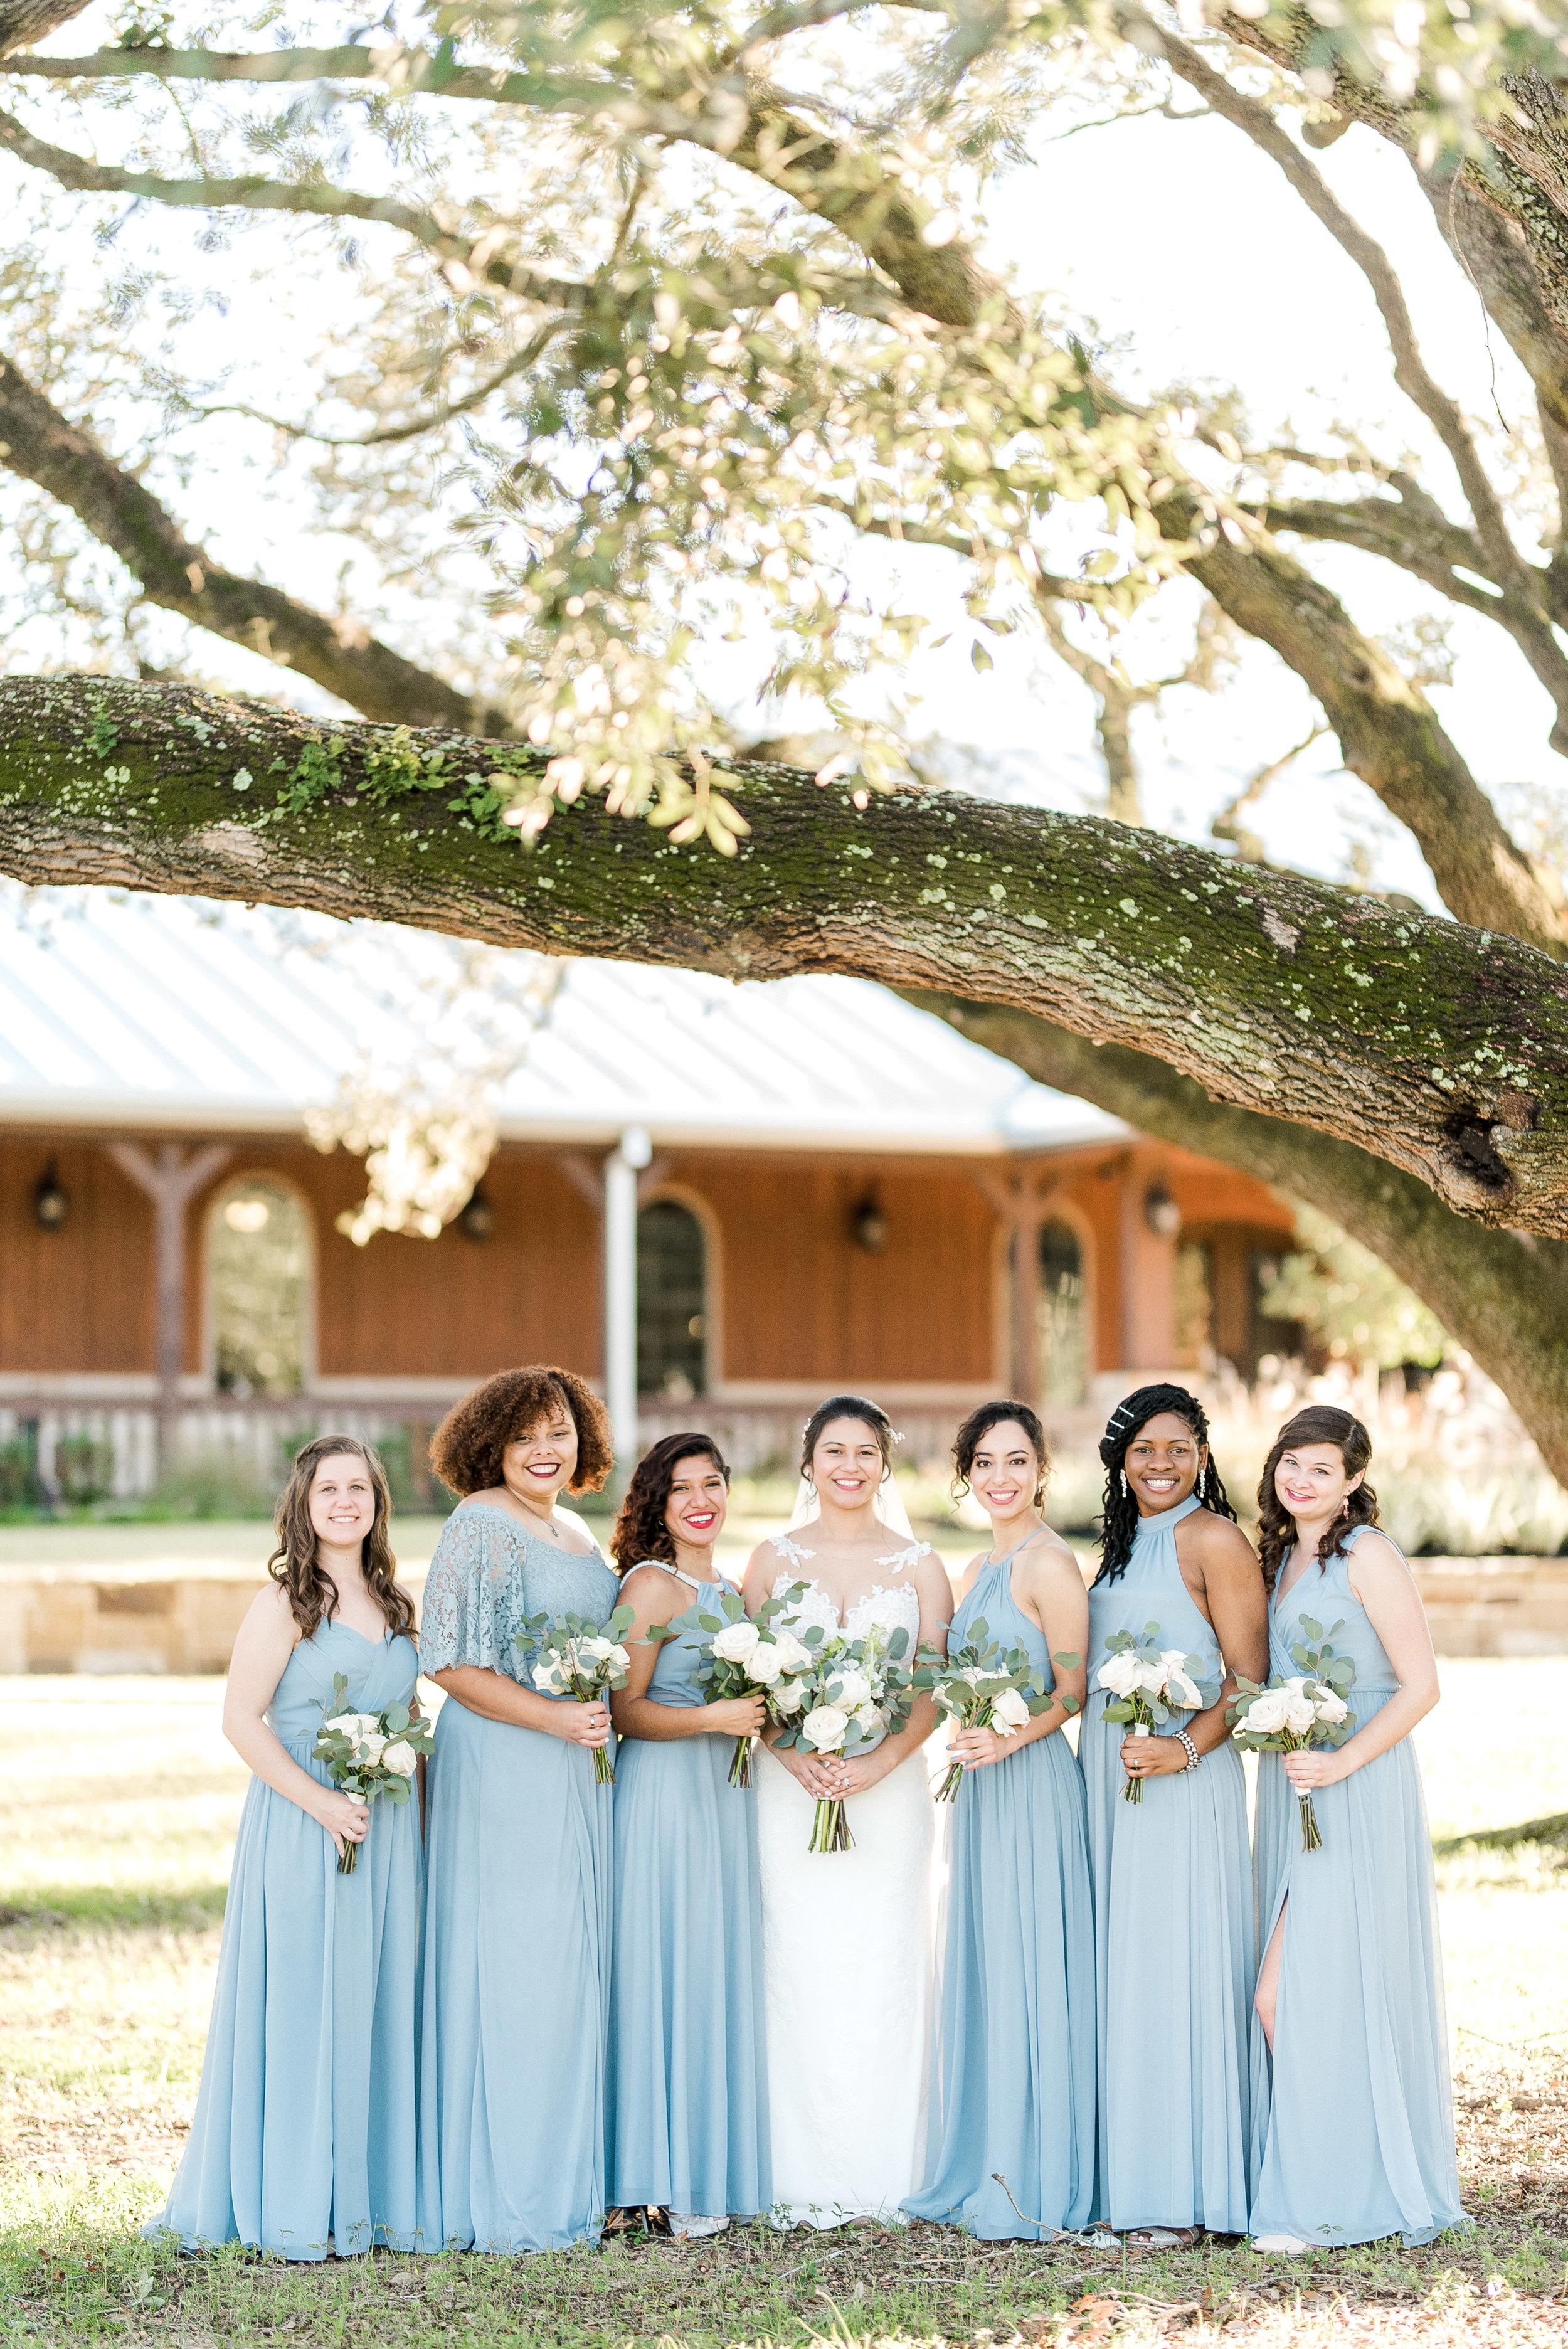 Dusty Blue Bridesmaid dresses.